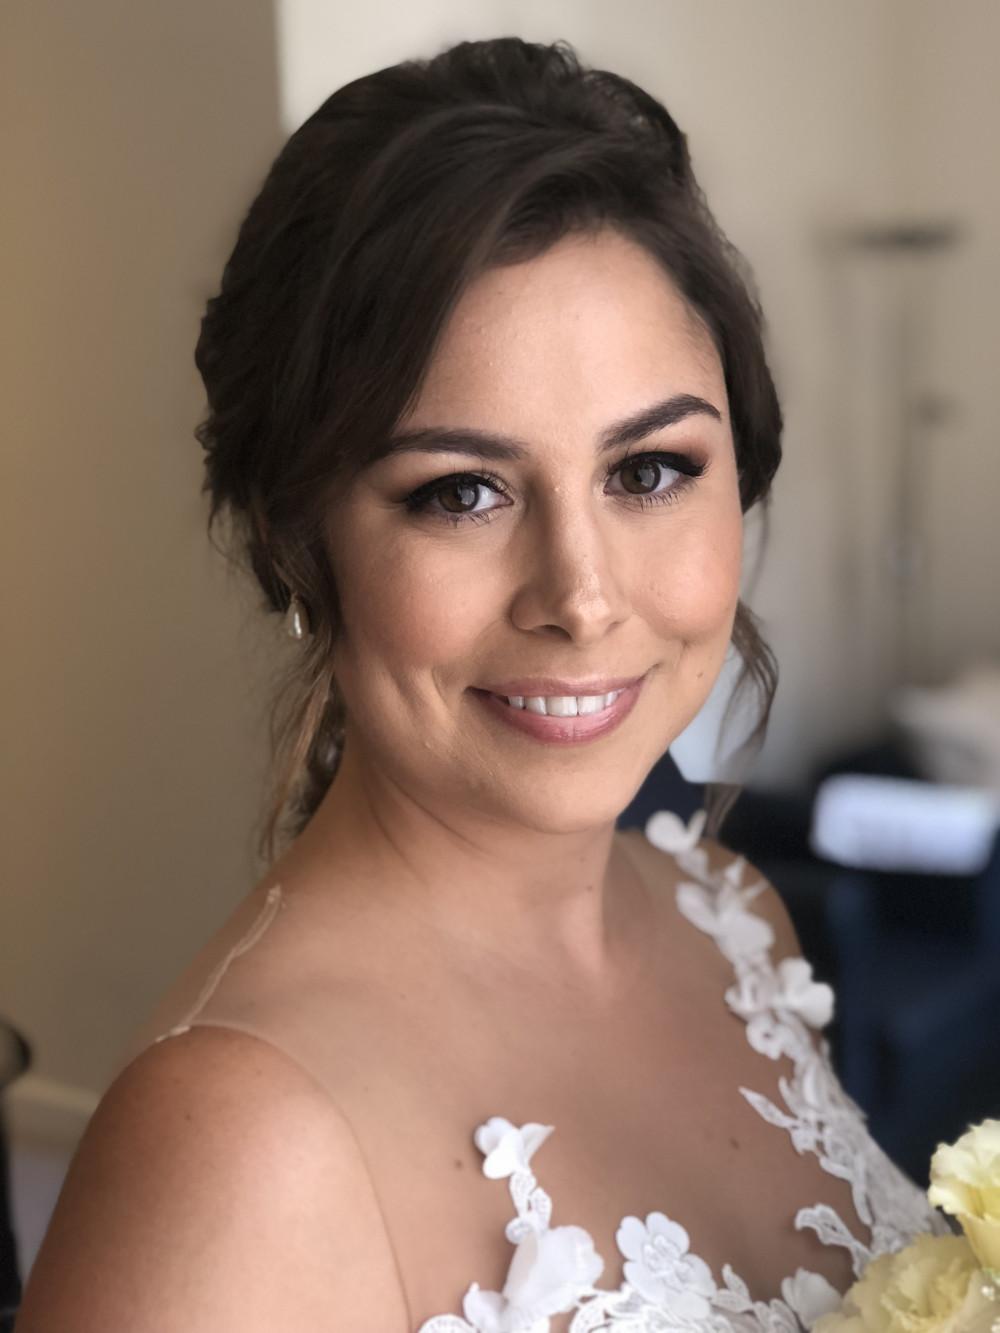 - Make Me Bridal Artist: Laura Anne Hair & Makeup Designer. #naturalmakeup #bridalmakeup #makeupartist #weddingmakeup #falselashes #glowingskin #freshmakeup #softglammakeup #classic #glamorous #pretty